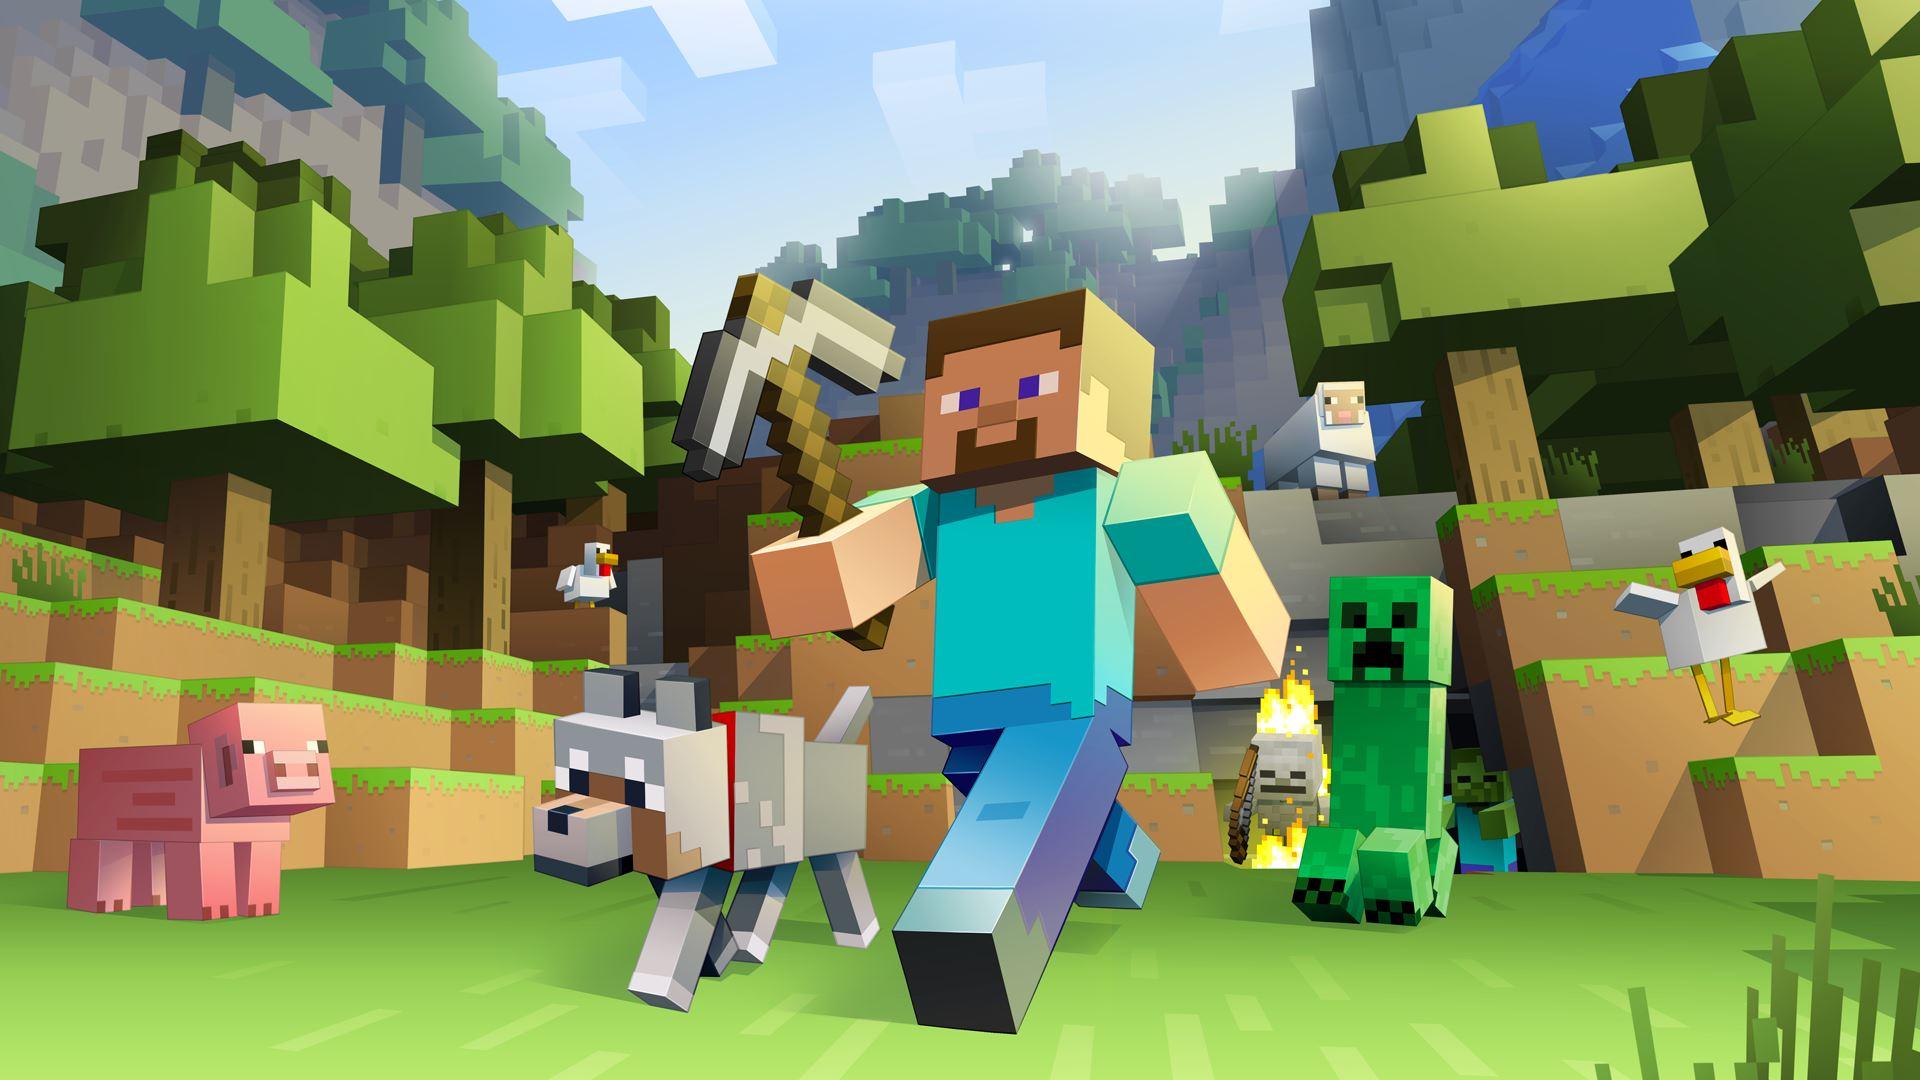 Minecraft / Обои на рабочий стол, заставки, картинки